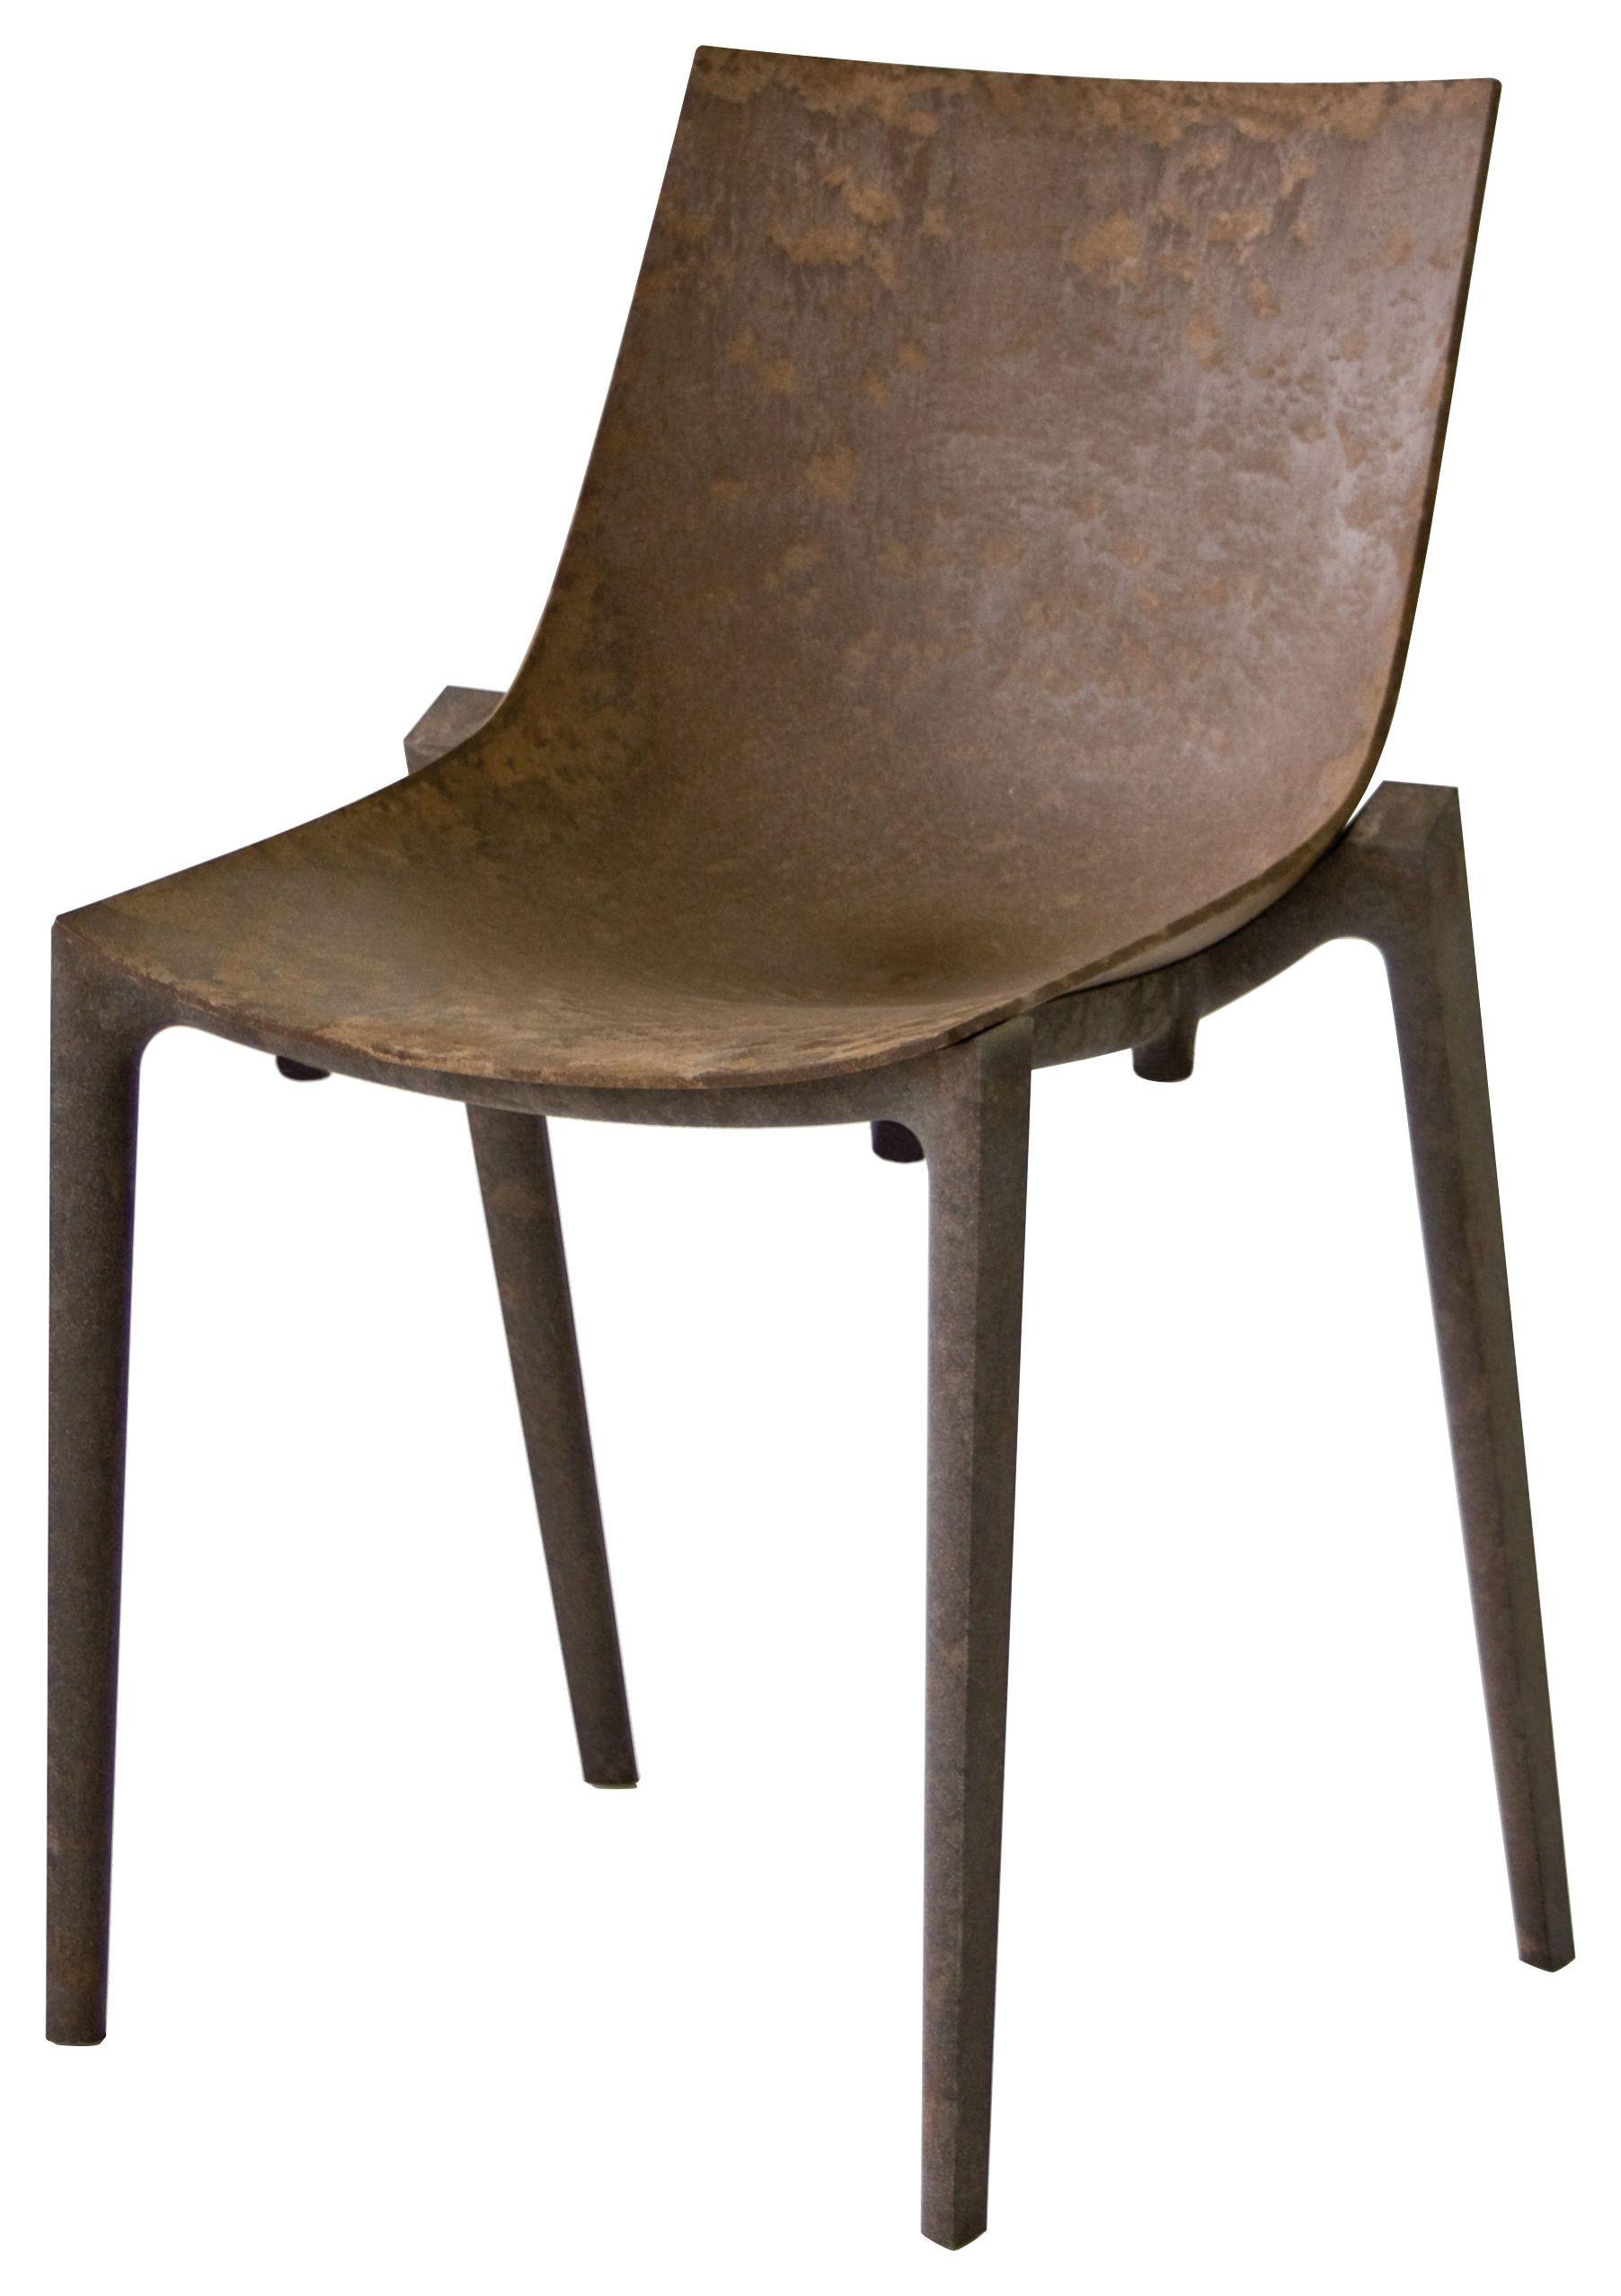 Philippe starck outdoor chair - Chaise Empilable Zartan Raw Fibre De Bois